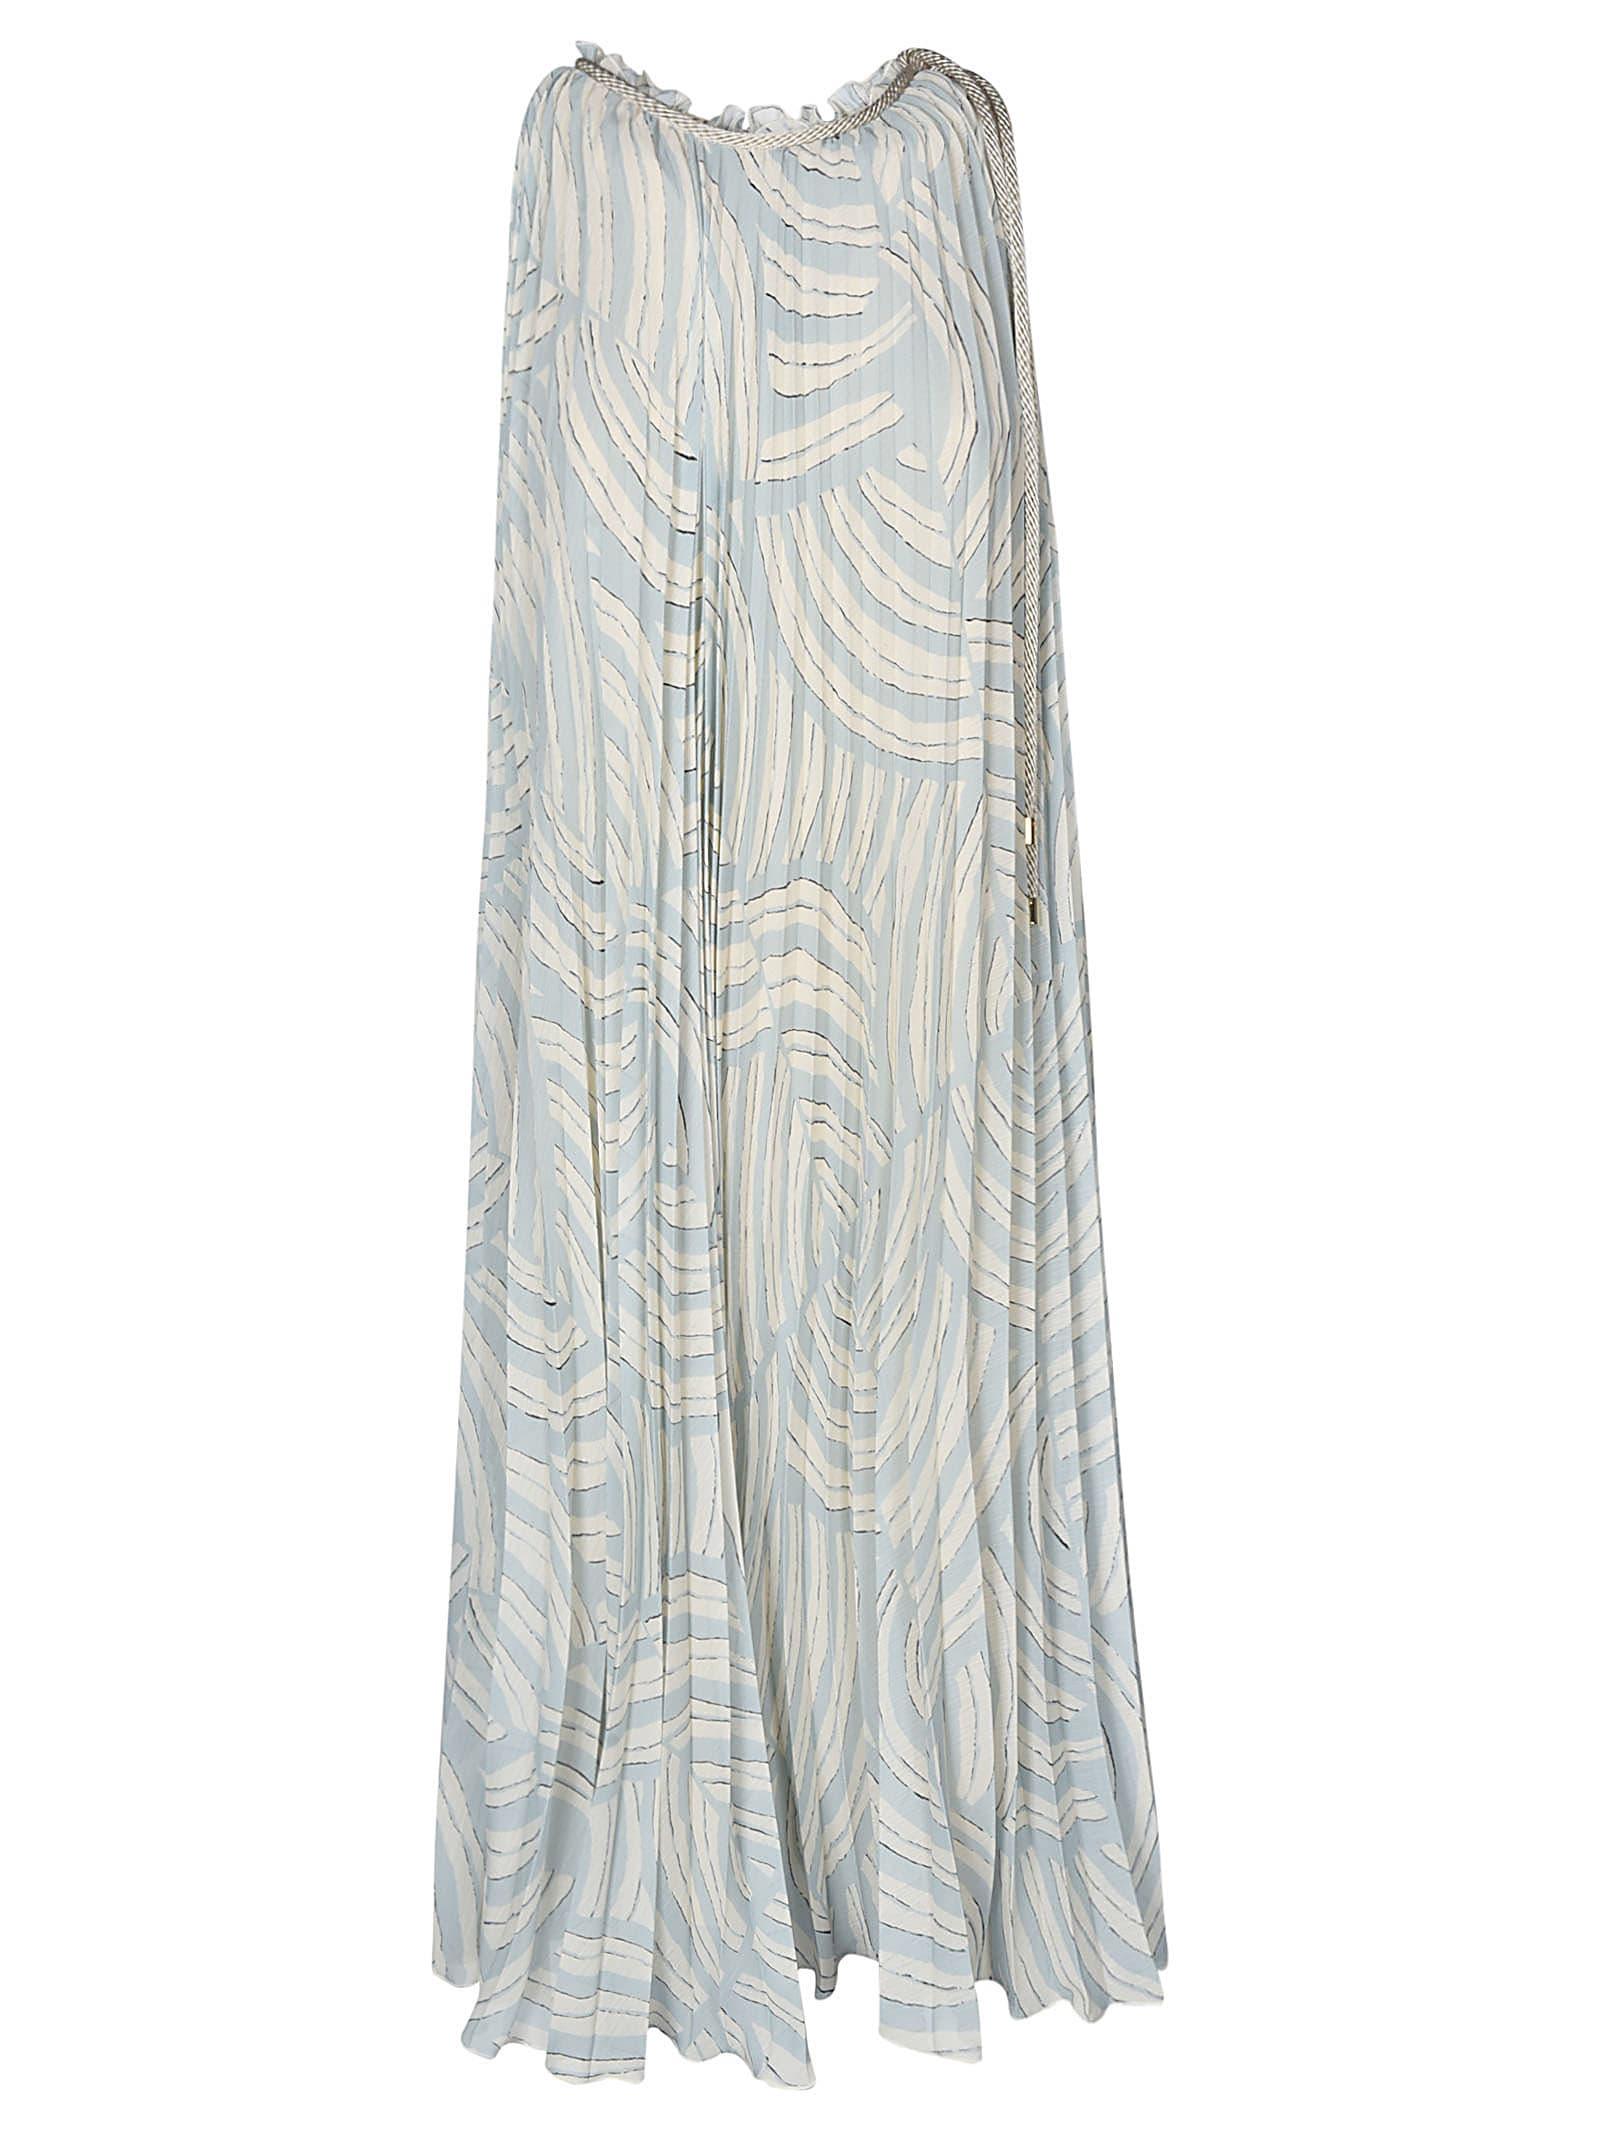 Buy Erika Cavallini Pleated Printed Sleeveless Dress online, shop Erika Cavallini with free shipping